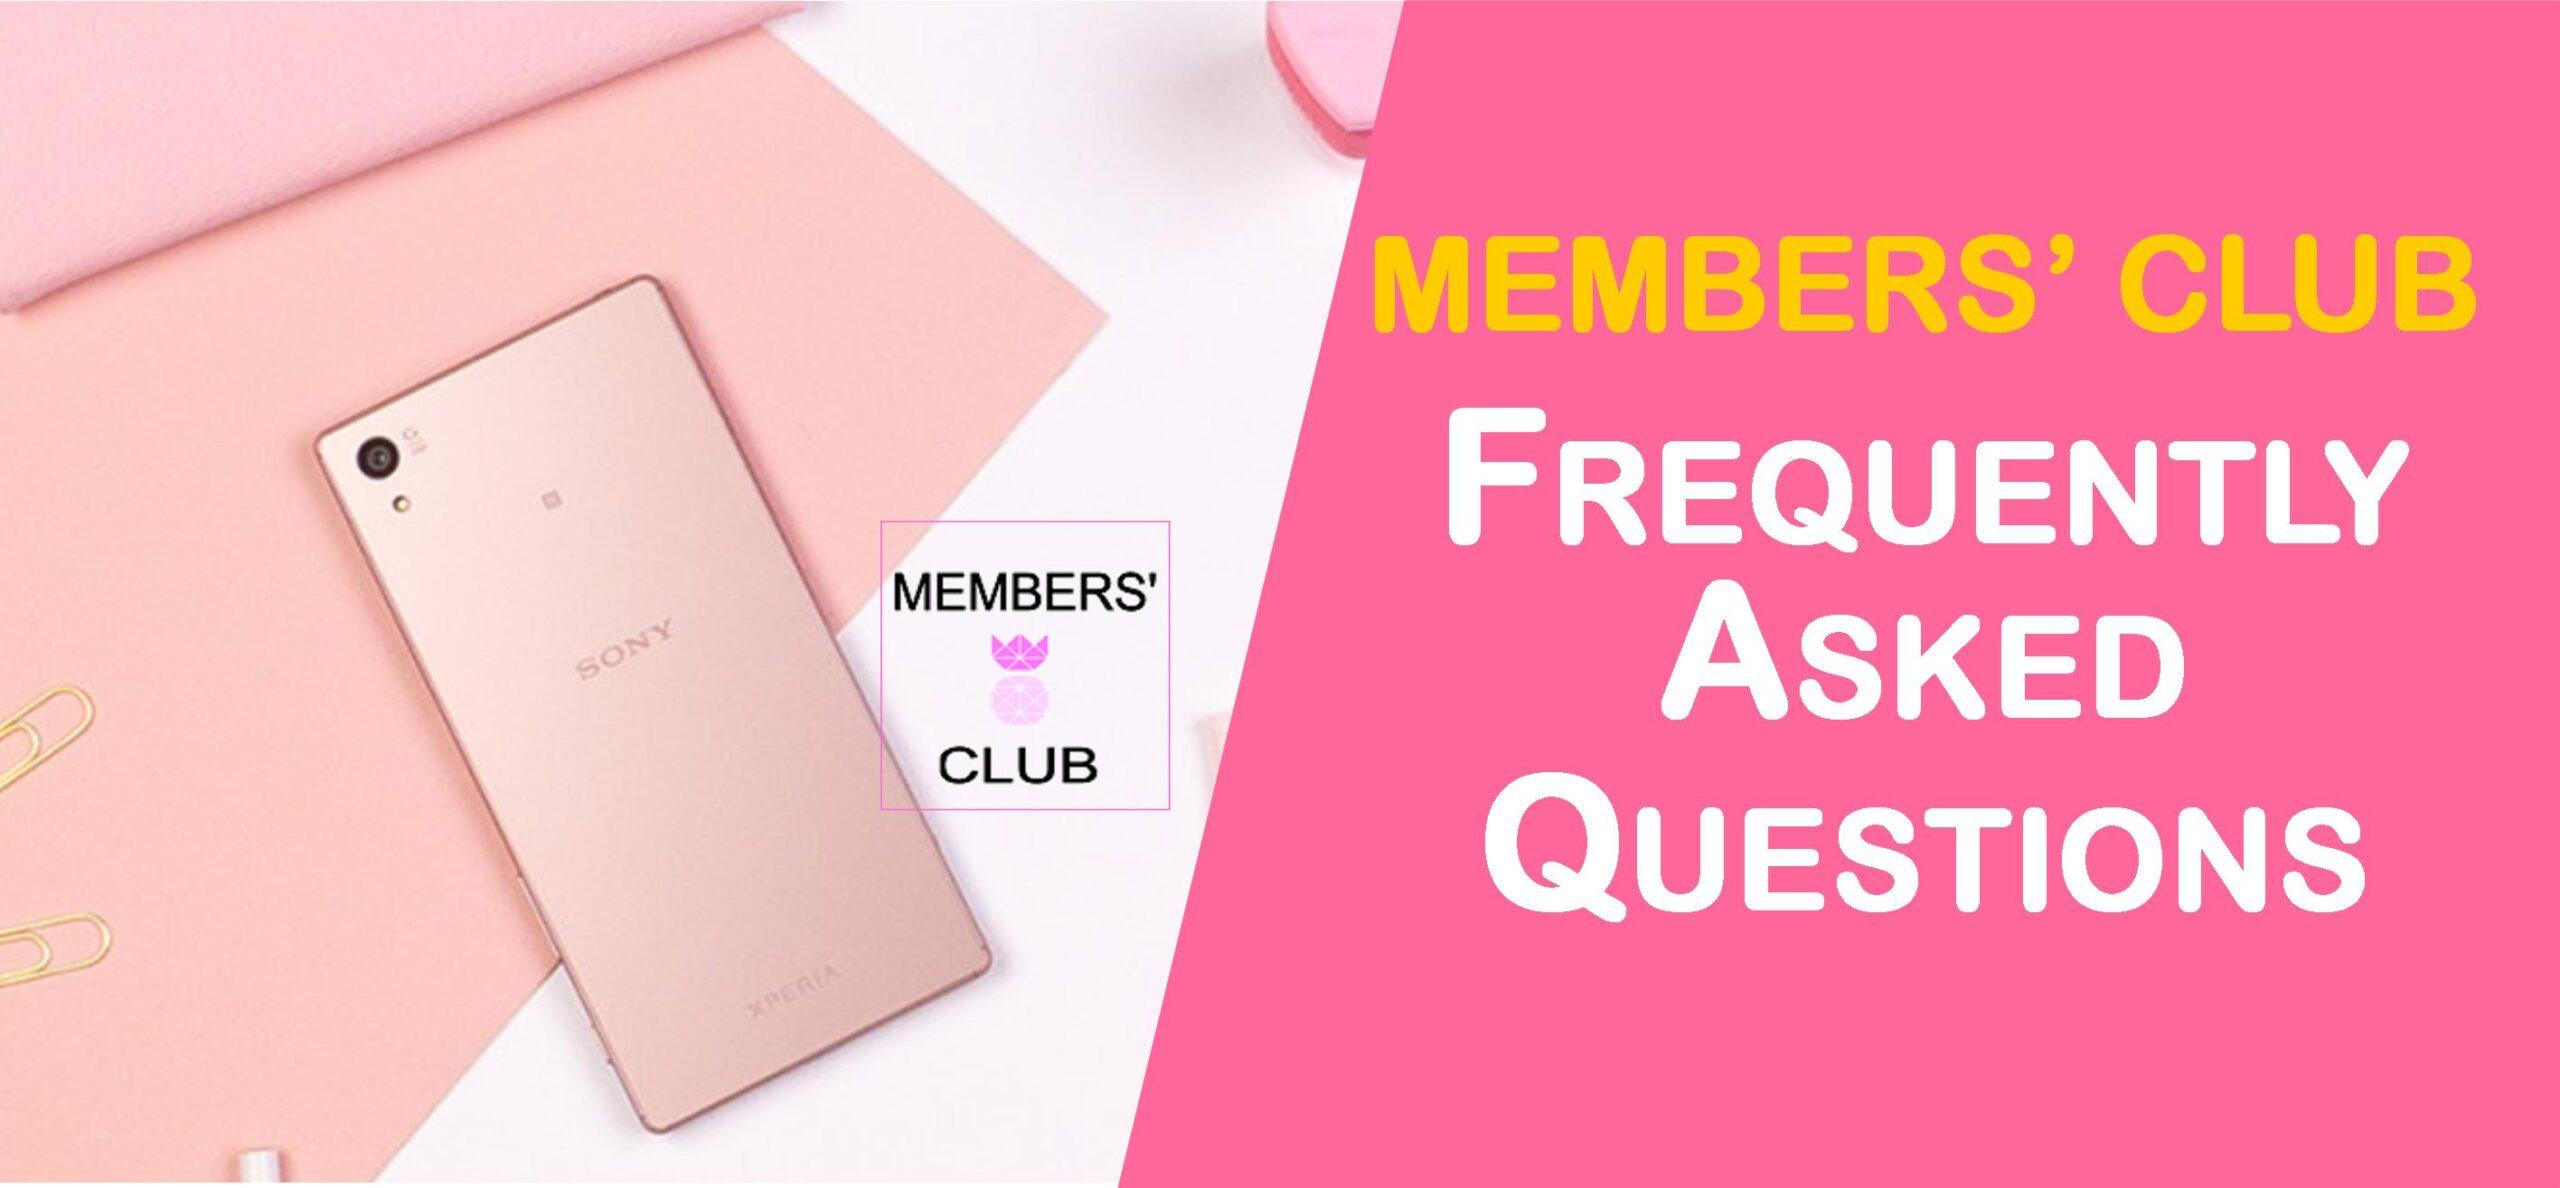 The Members' Club FAQ